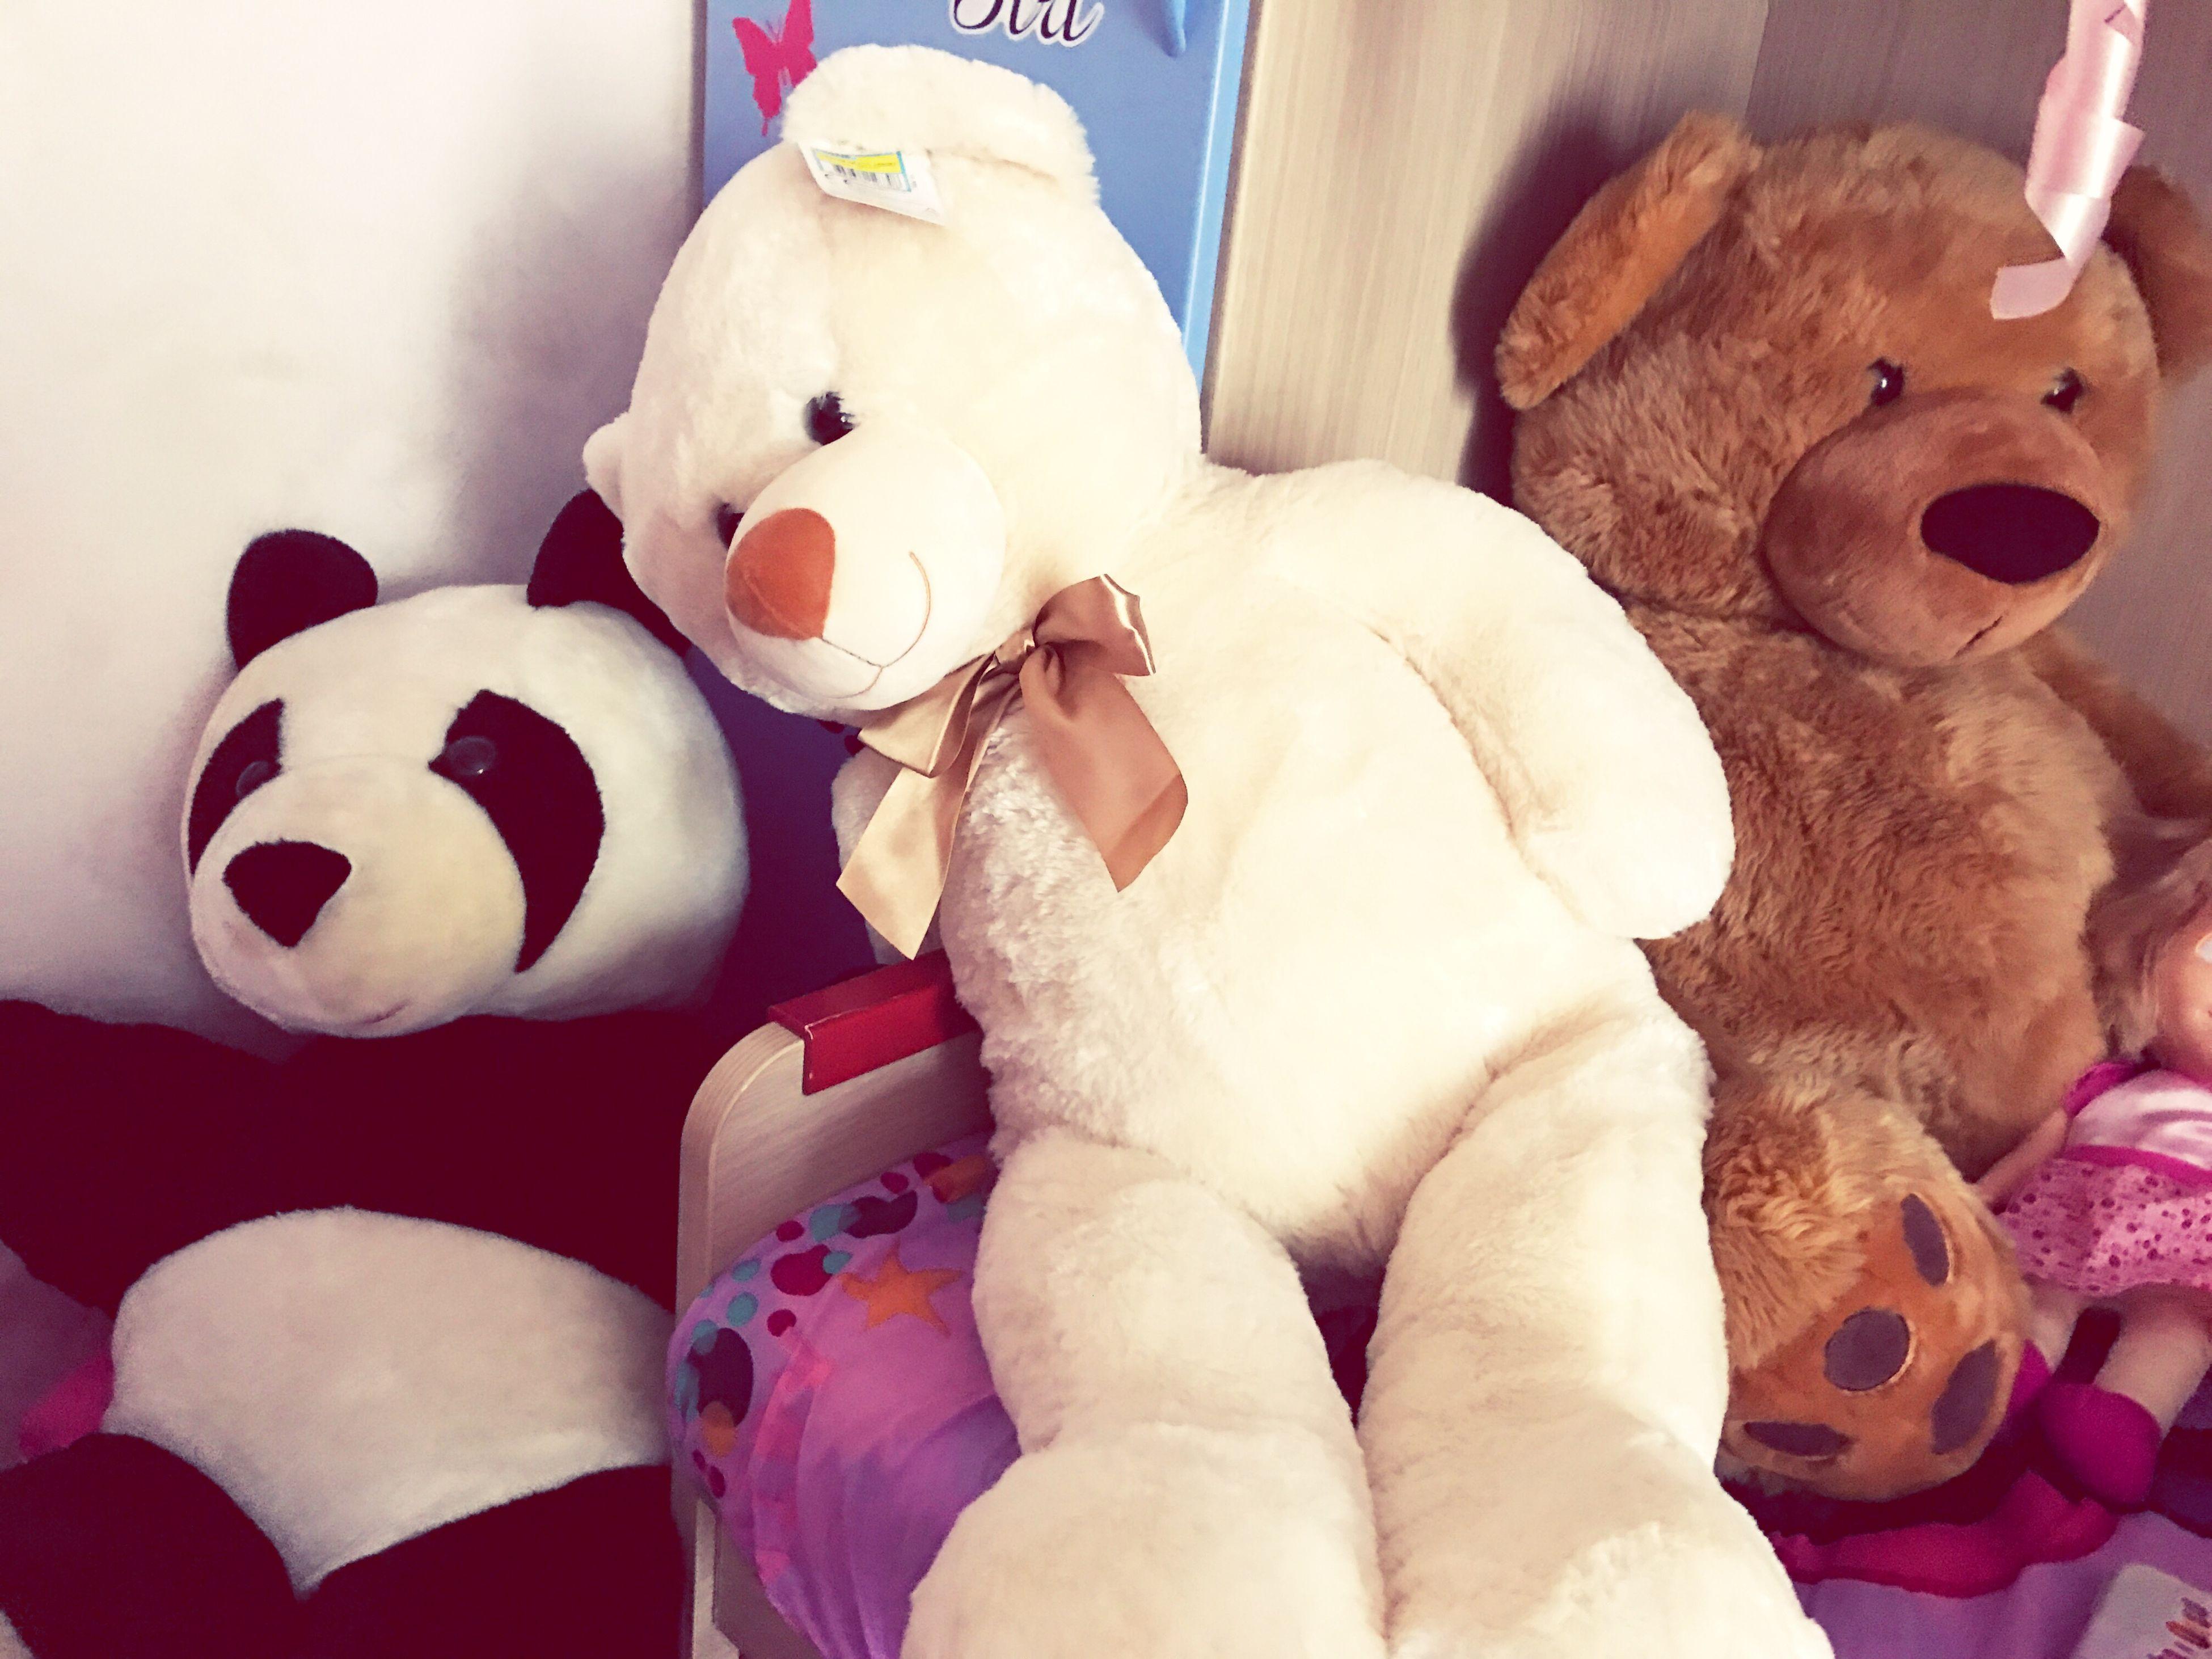 animal representation, indoors, teddy bear, christmas, no people, stuffed toy, close-up, christmas decoration, childhood, christmas ornament, day